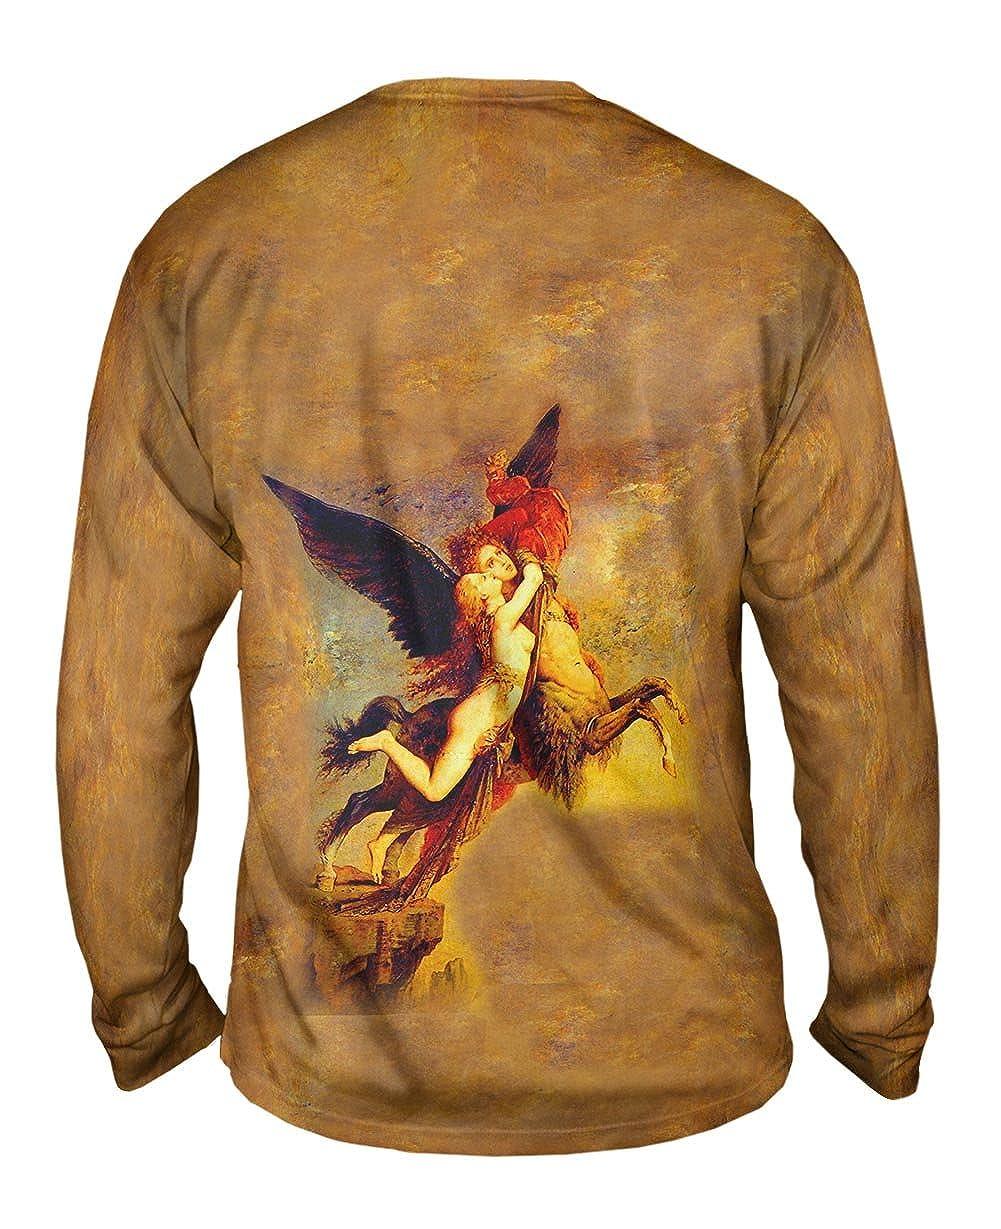 Yizzam- Gustave Moreau The Chimera -TShirt- Mens Long Sleeve 1856